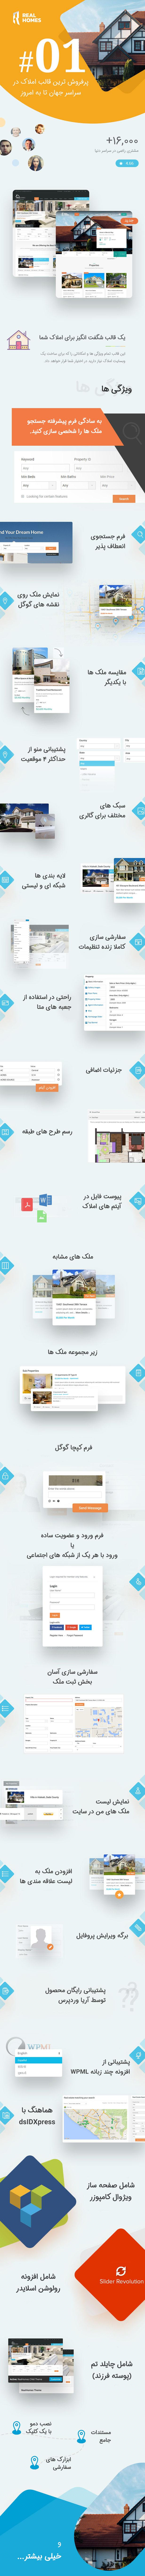 قالب املاک وردپرس ریل هوم   Real Homes WordPress Real Estate Theme   پوستهReal Homes  قالب Real Homes